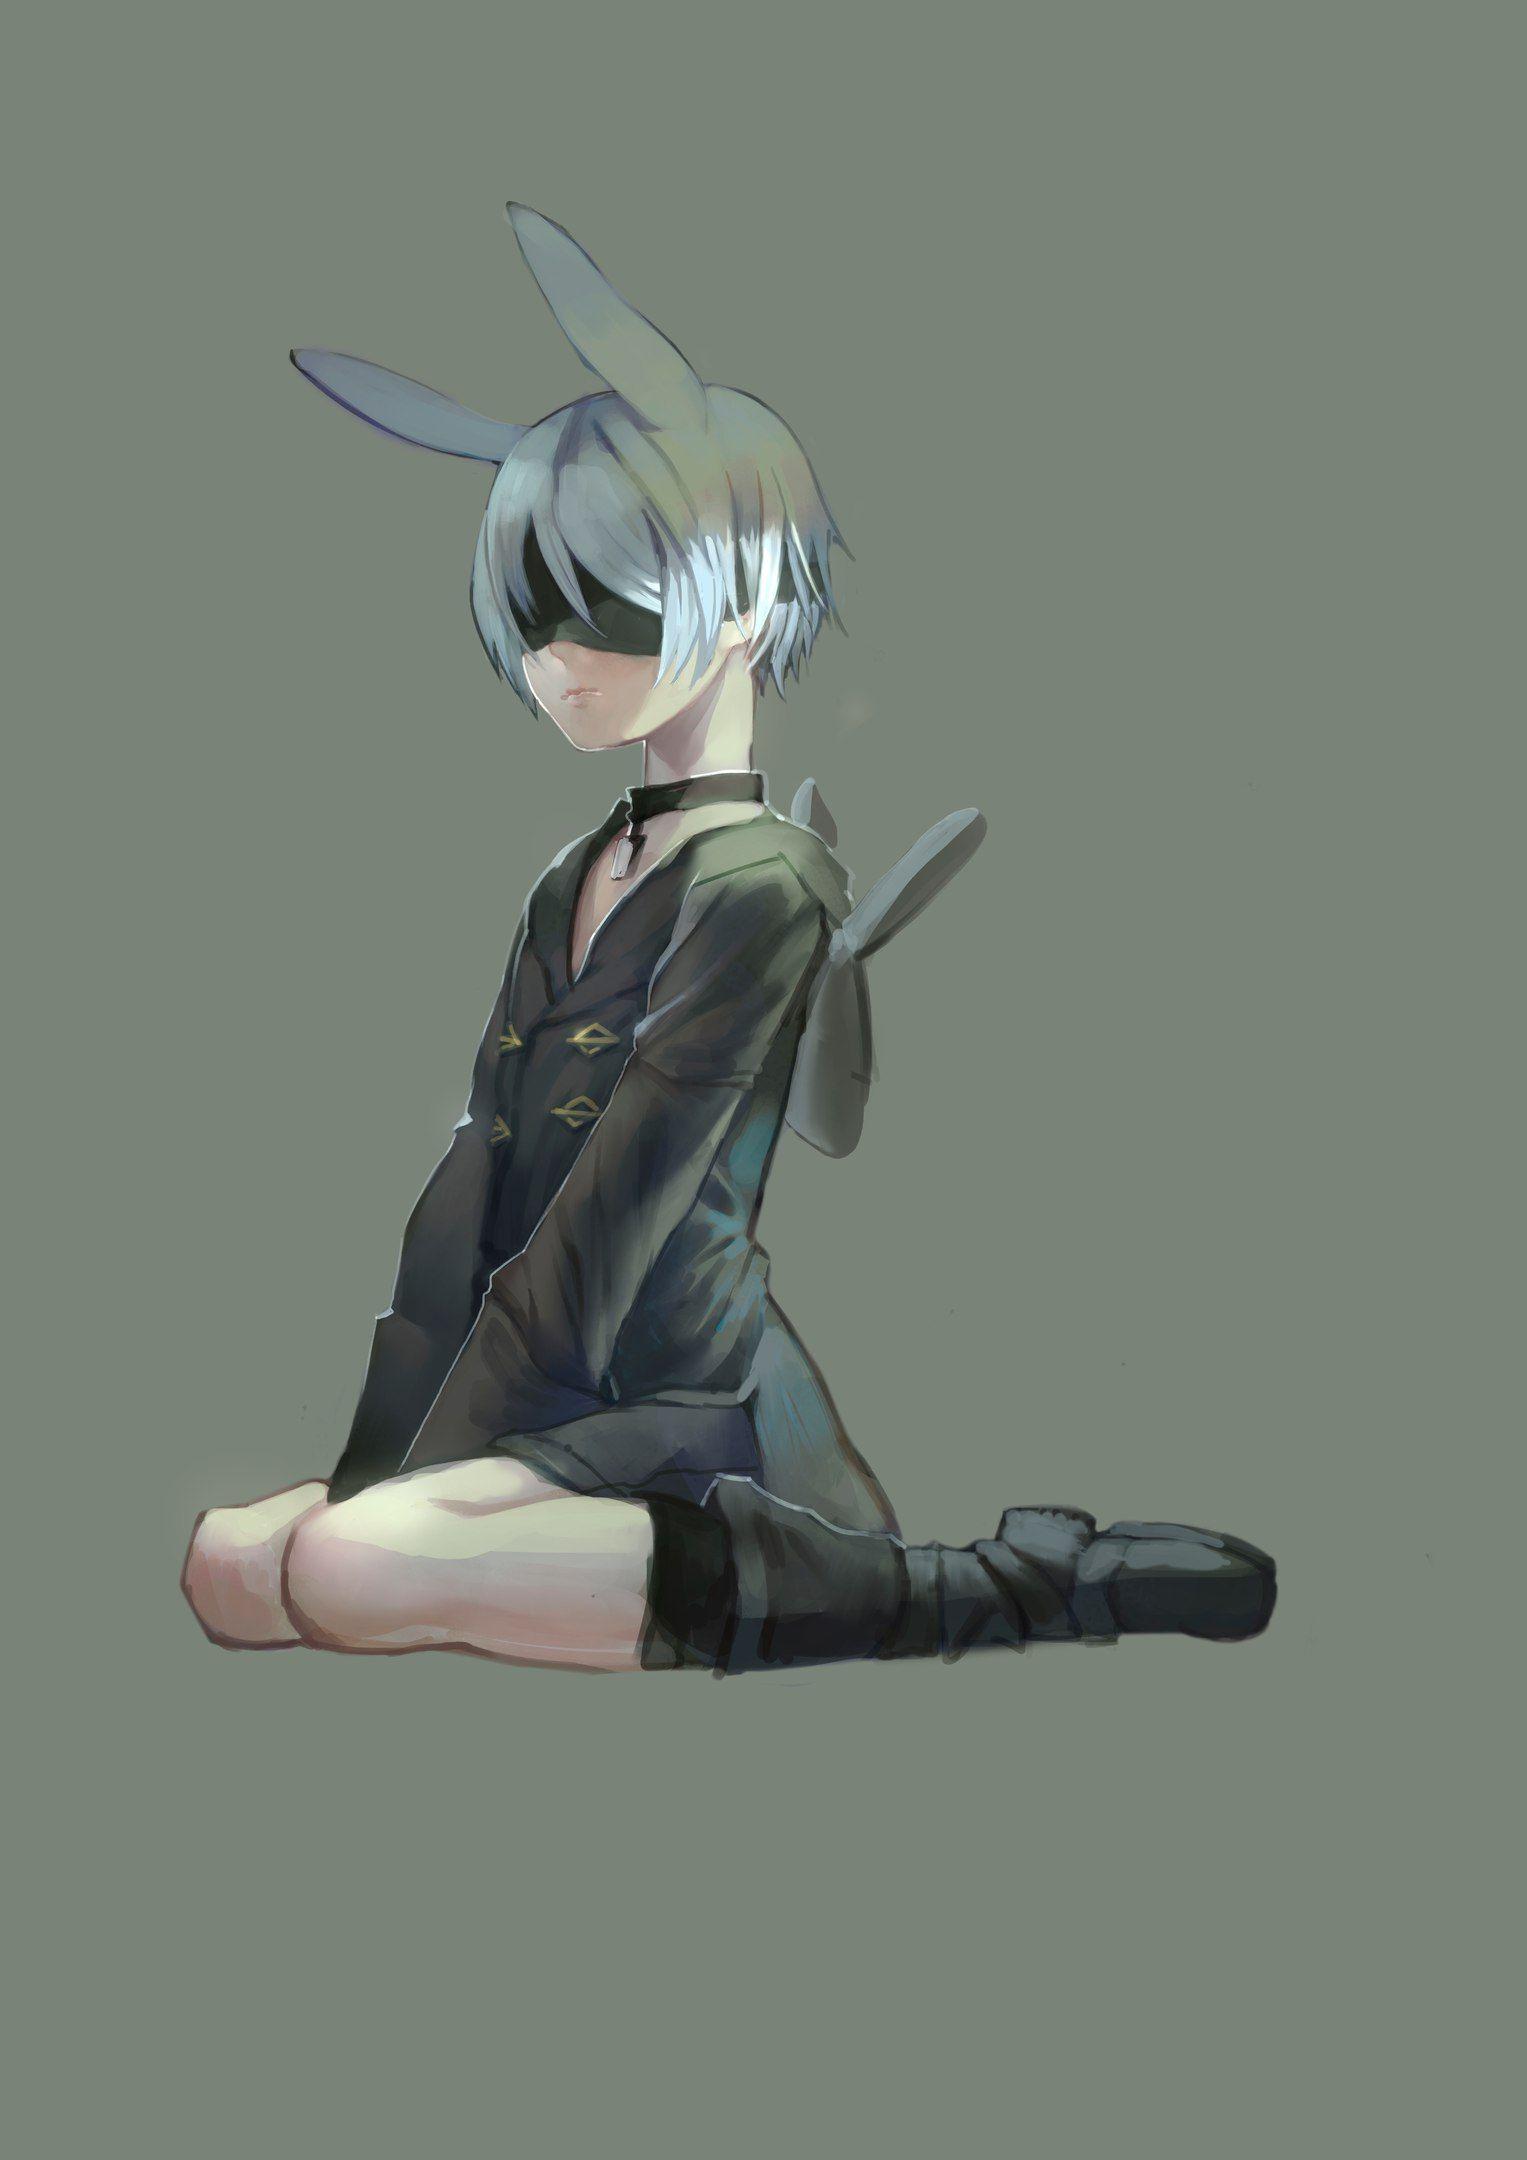 2b 9s エロアニメ